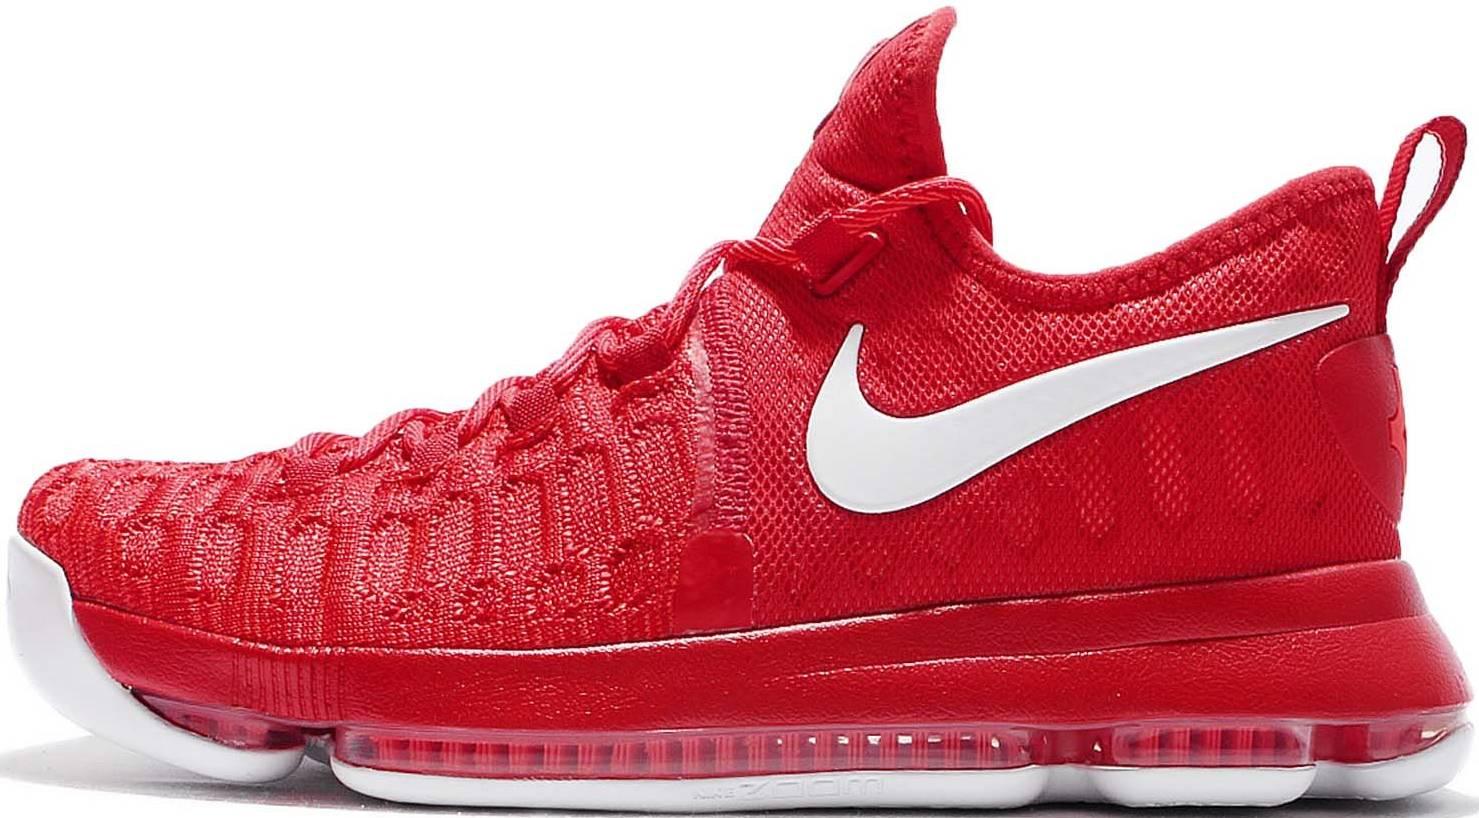 Perenne Medalla Proporcional  Nike KD 9 - Deals ($120), Facts, Reviews (2021) | RunRepeat